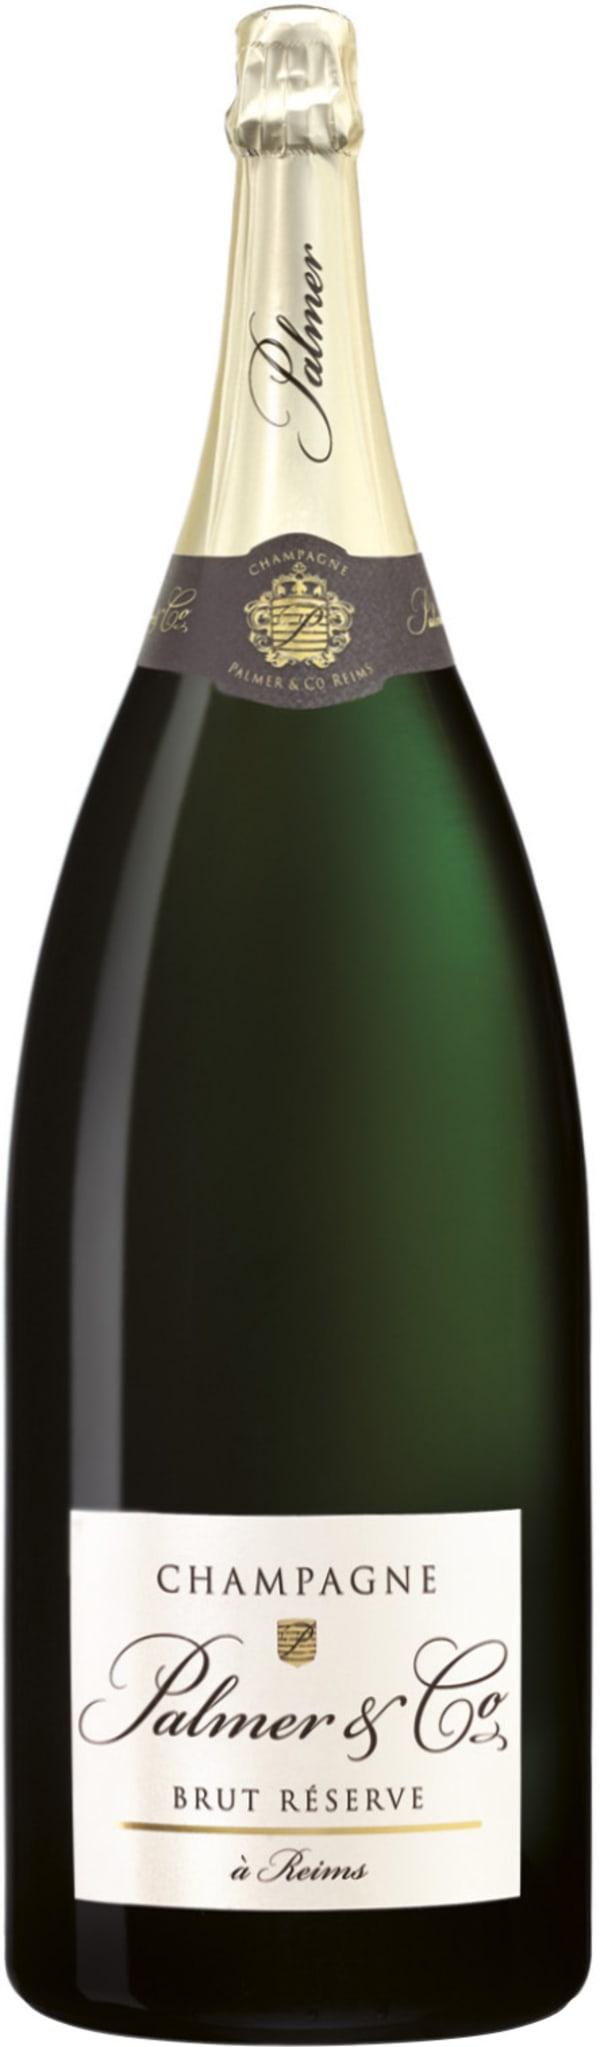 Palmer & Co Réserve Champagne Brut Nabuchodonosor